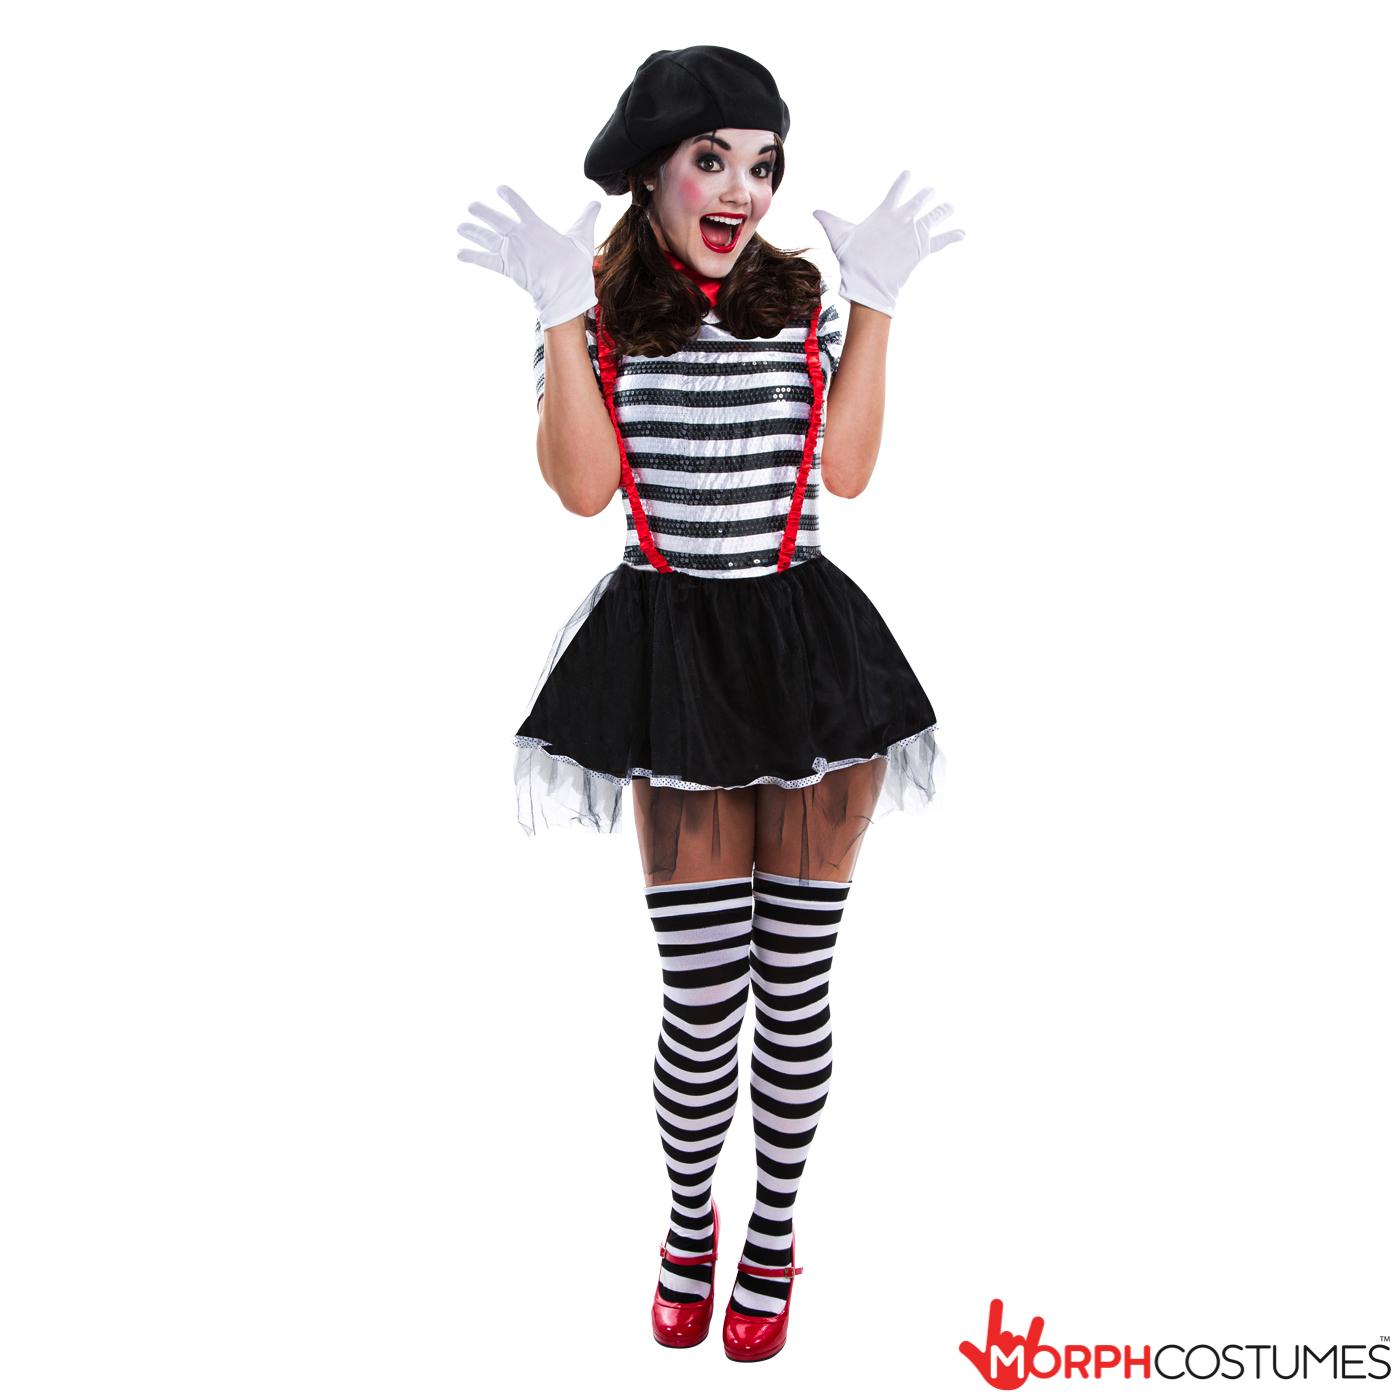 Women's Mime Artist Costume | Morph Costumes US